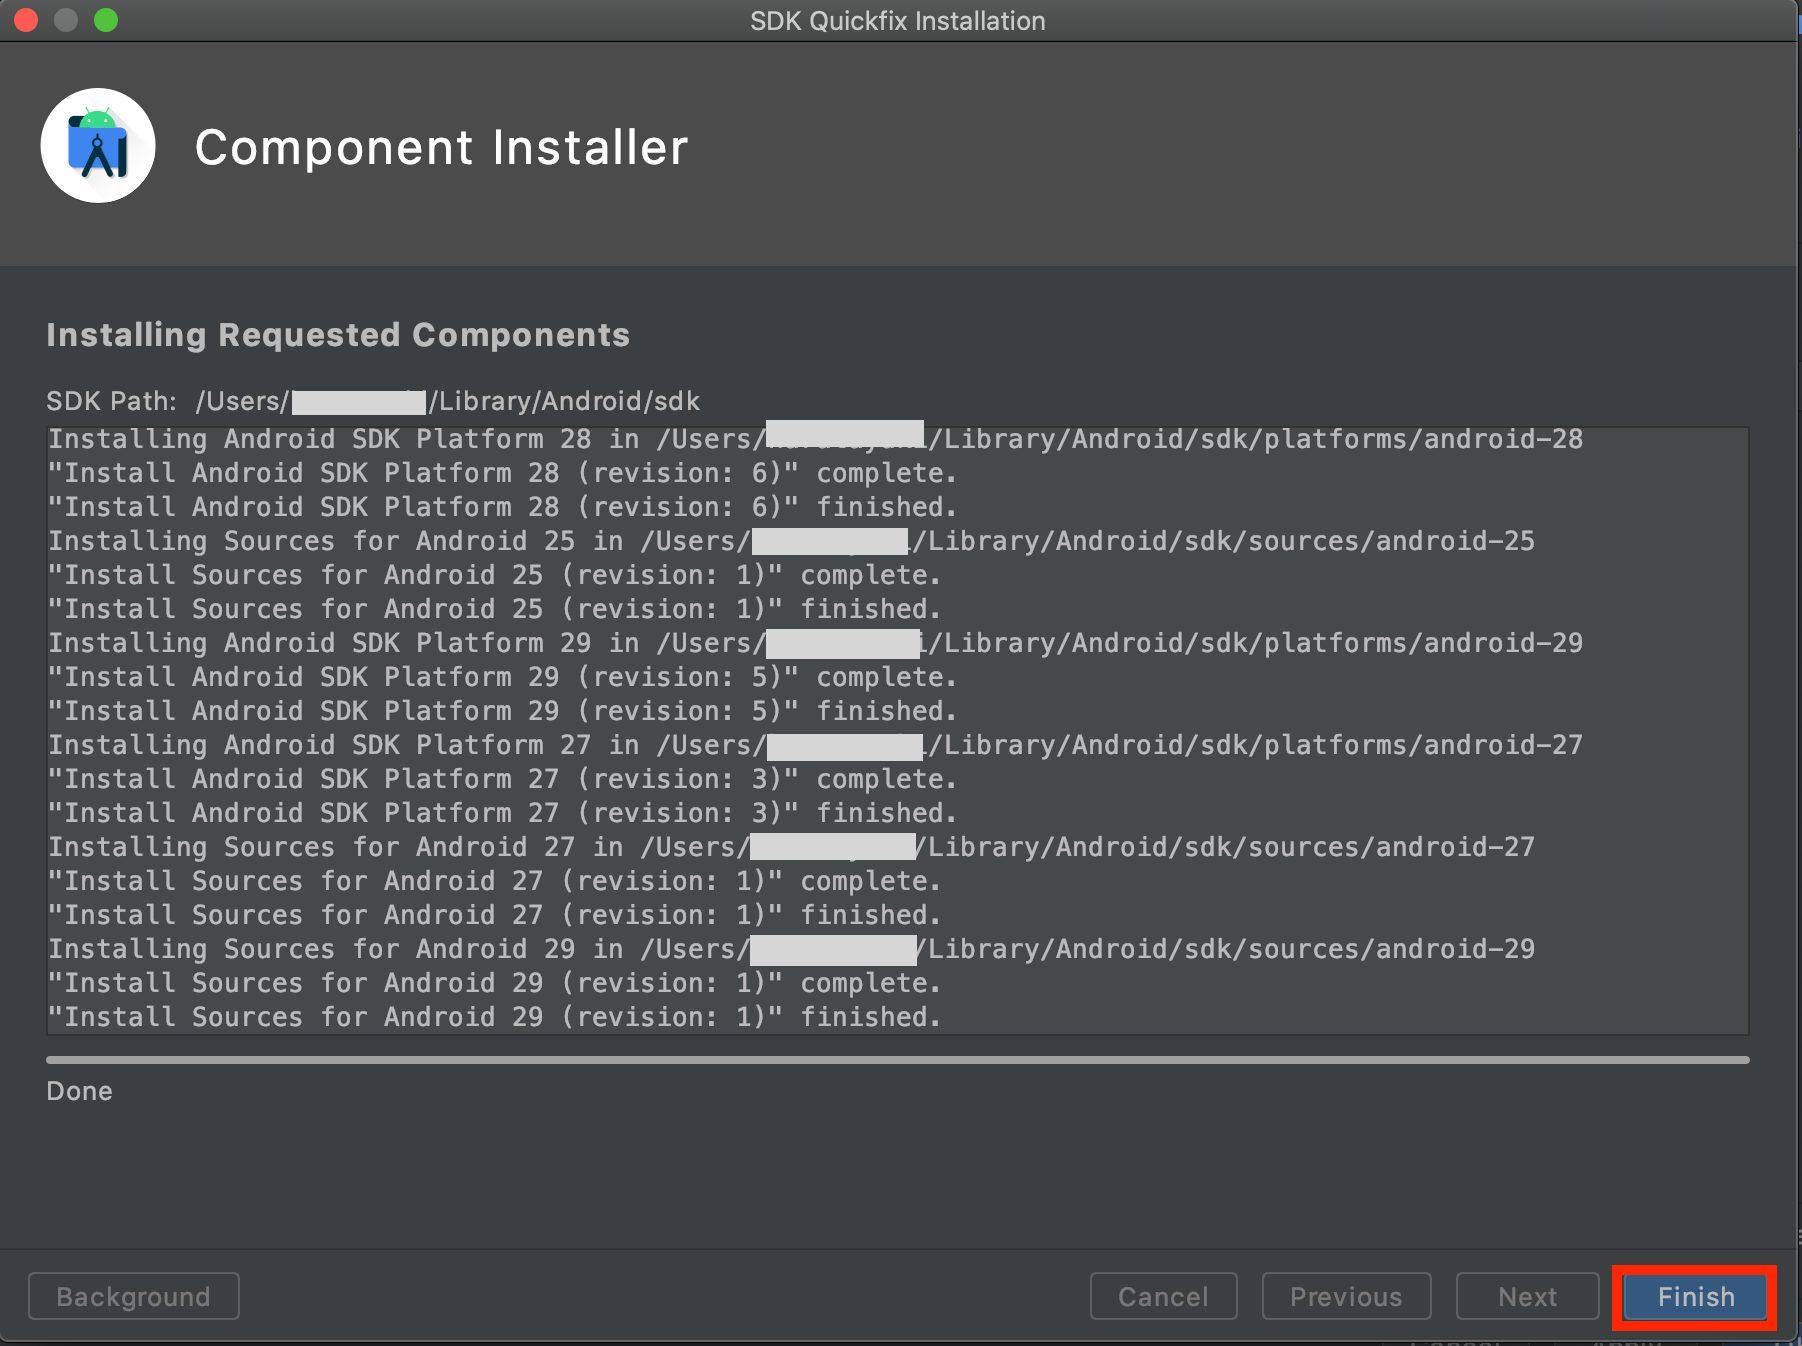 Android SDKダウンロード画面